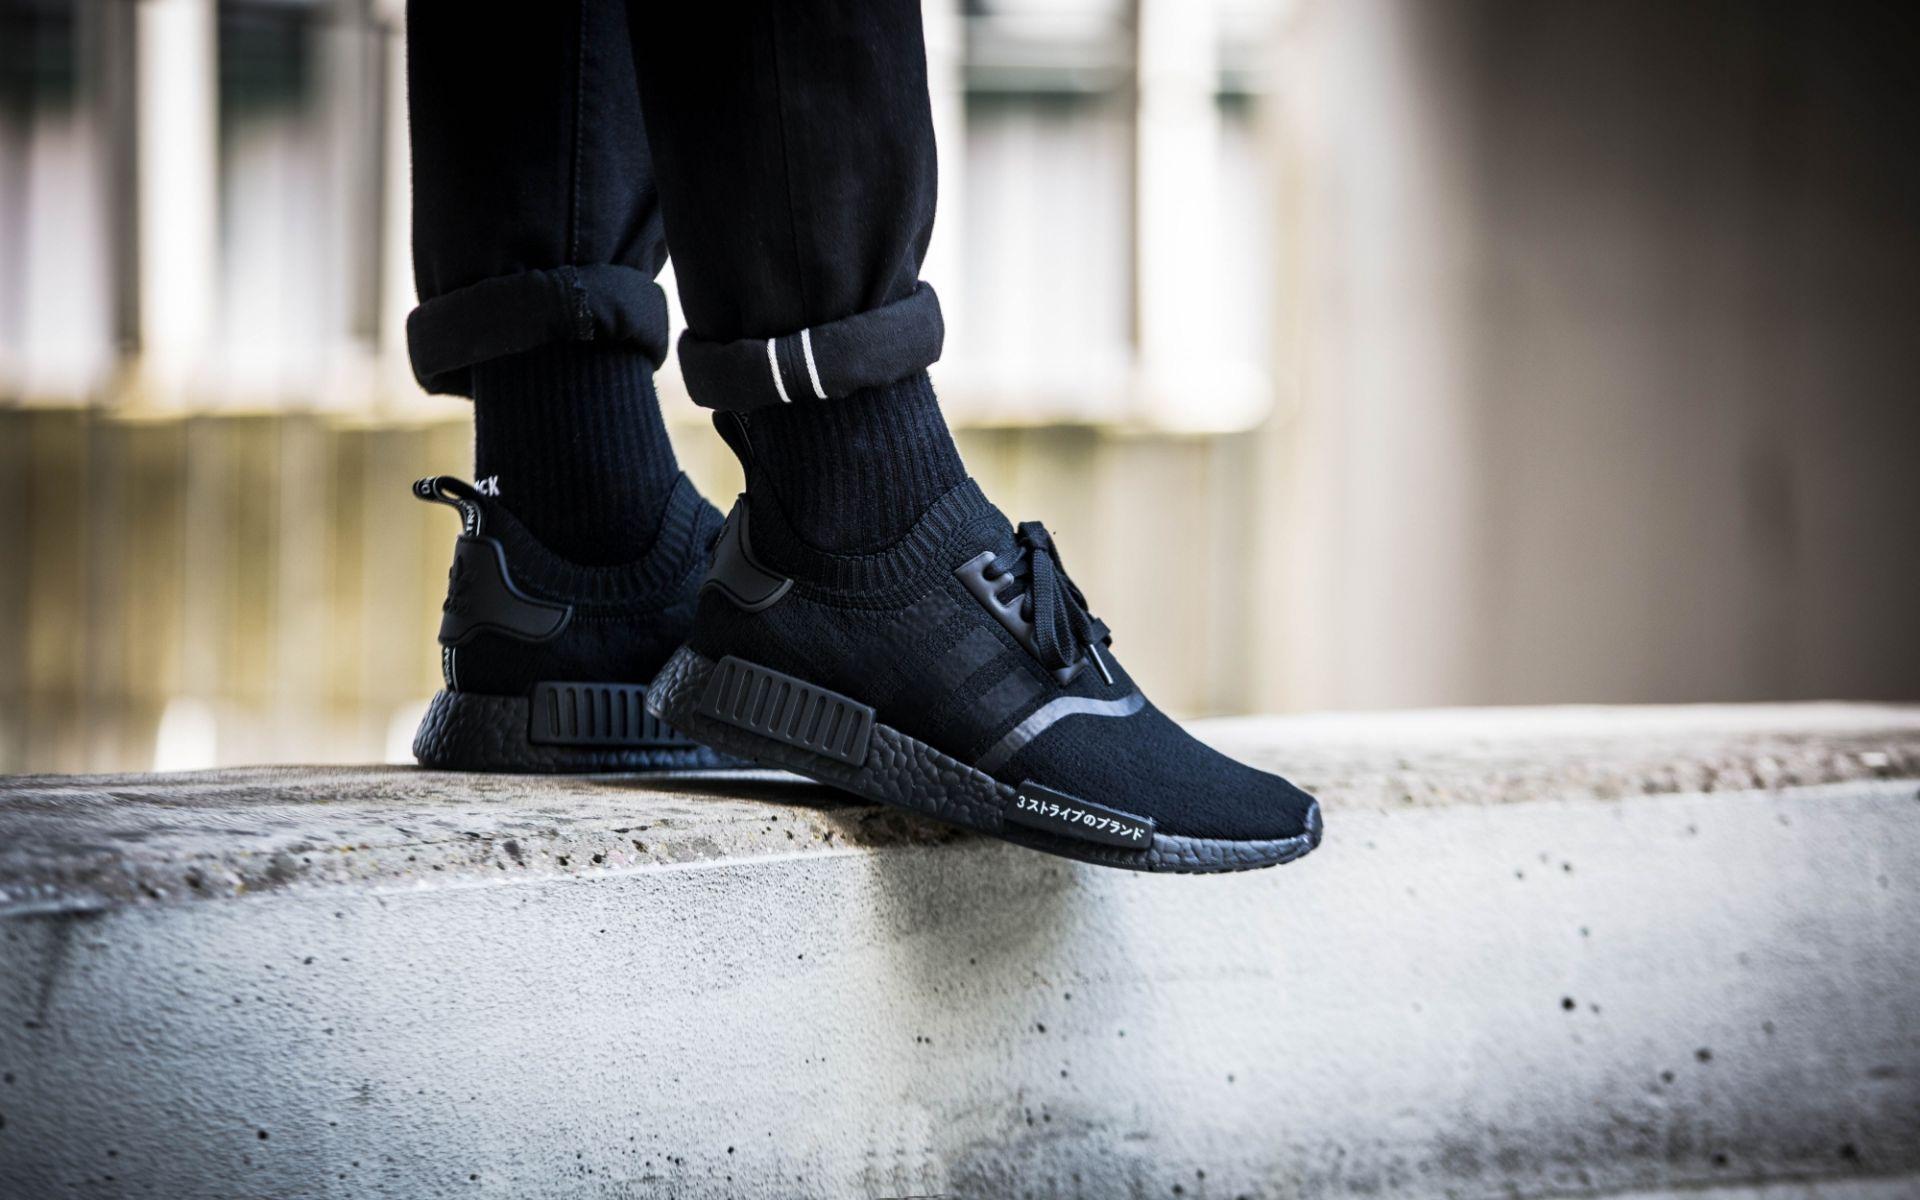 adidas-nmd_r1-pk-triple-black-japan